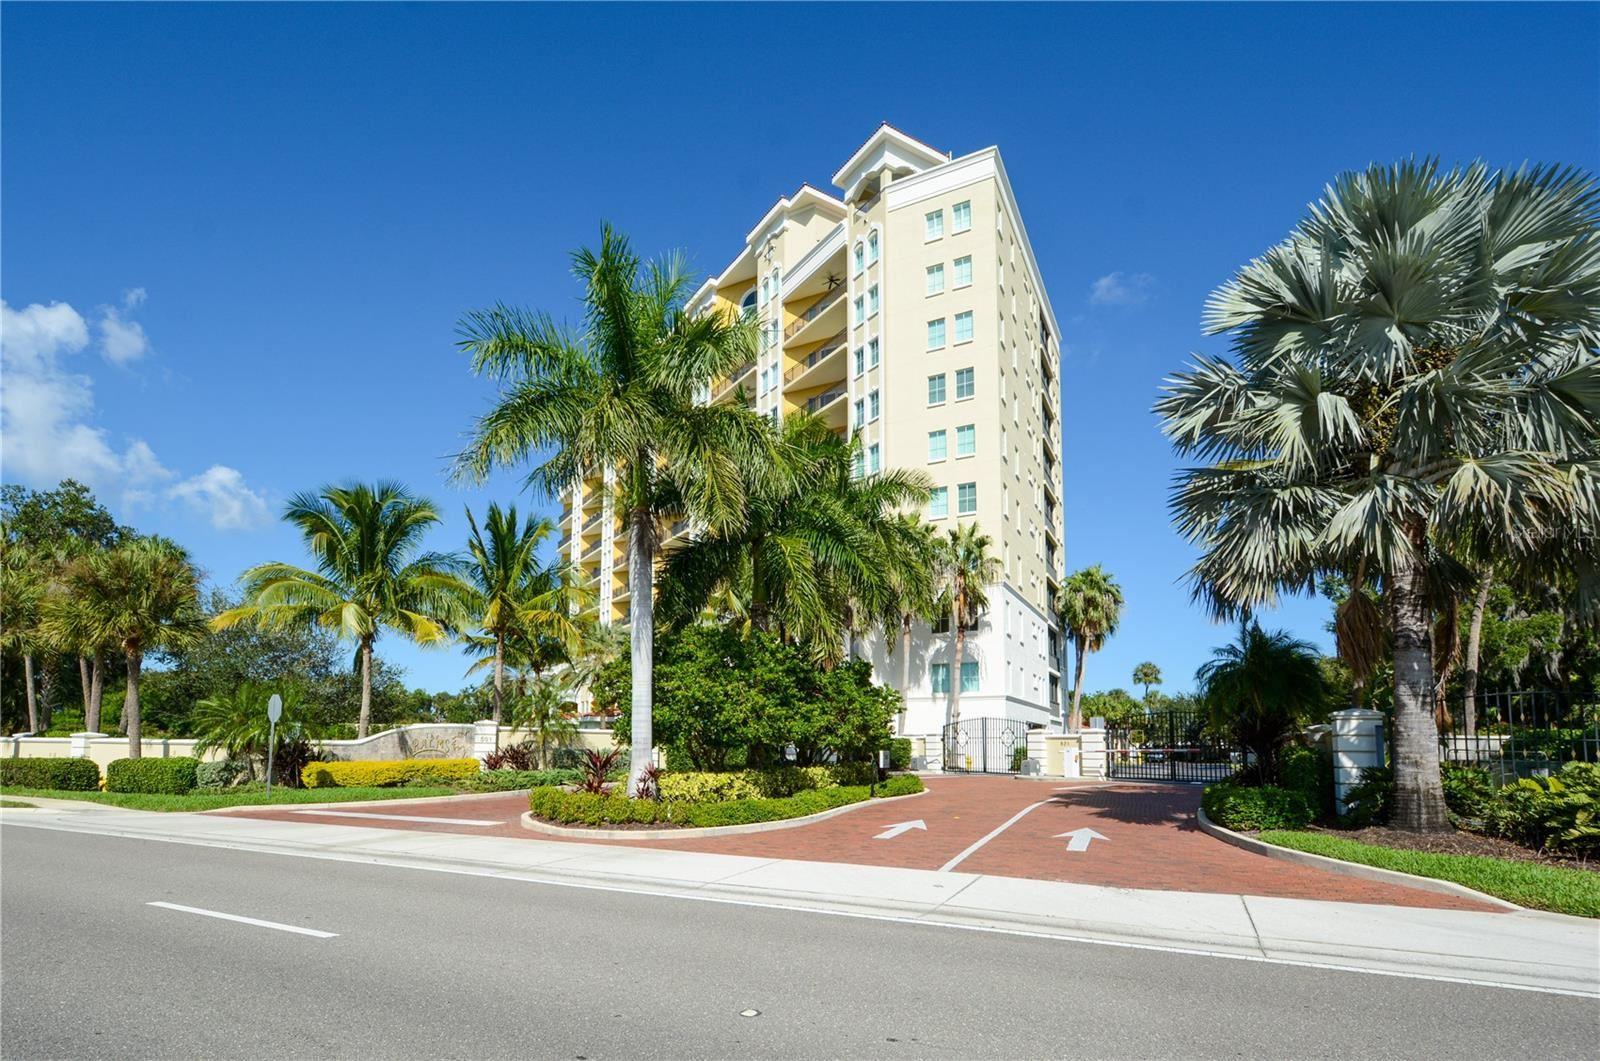 Photo of 501 HABEN BOULEVARD #706, PALMETTO, FL 34221 (MLS # A4512051)